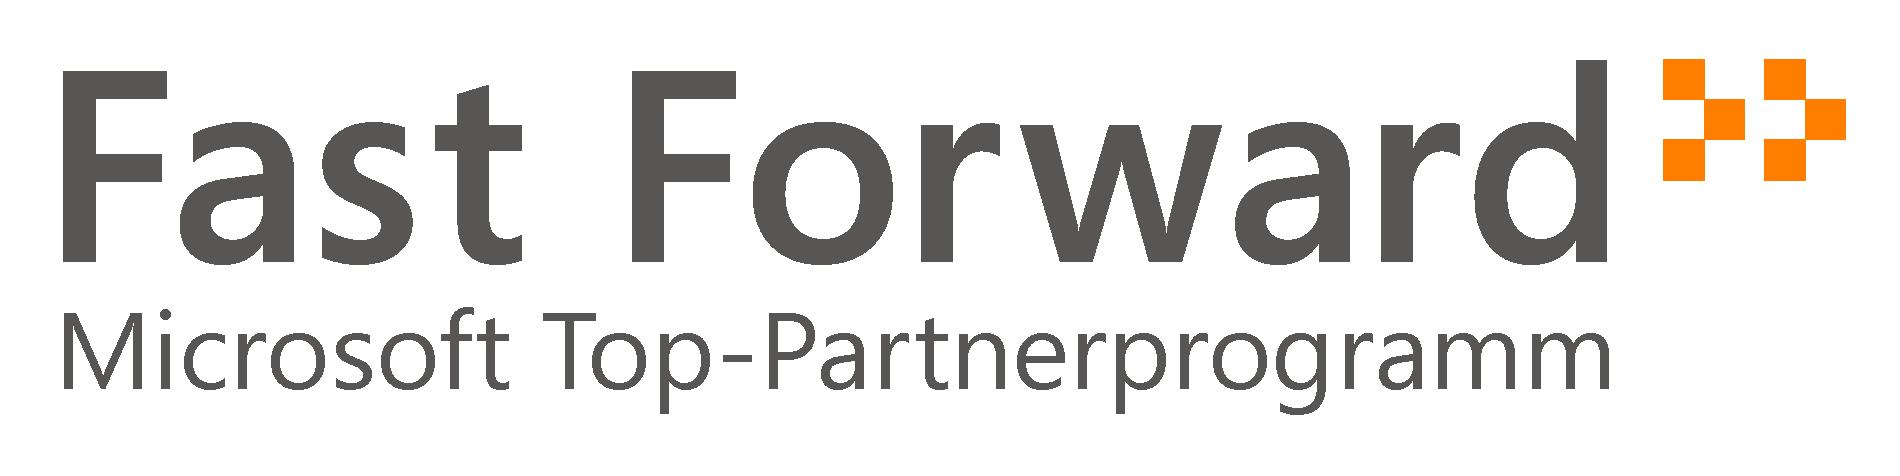 Fast Forward Microsoft Top-Partnerprogramm | Prodware